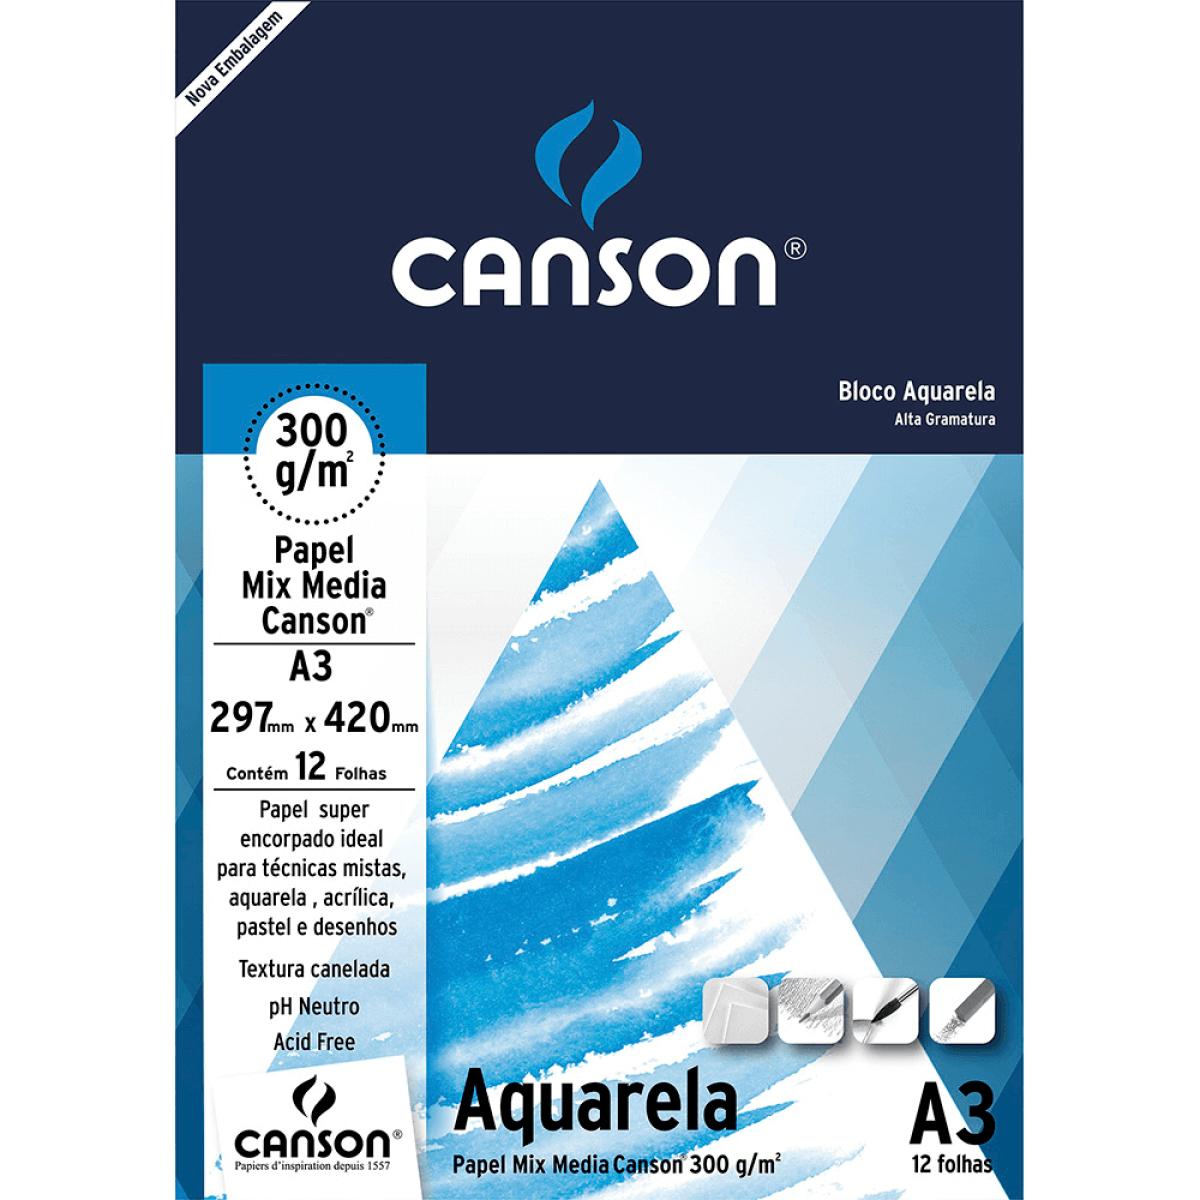 Bloco de Papel Aquarela A3 300g/m - Canson